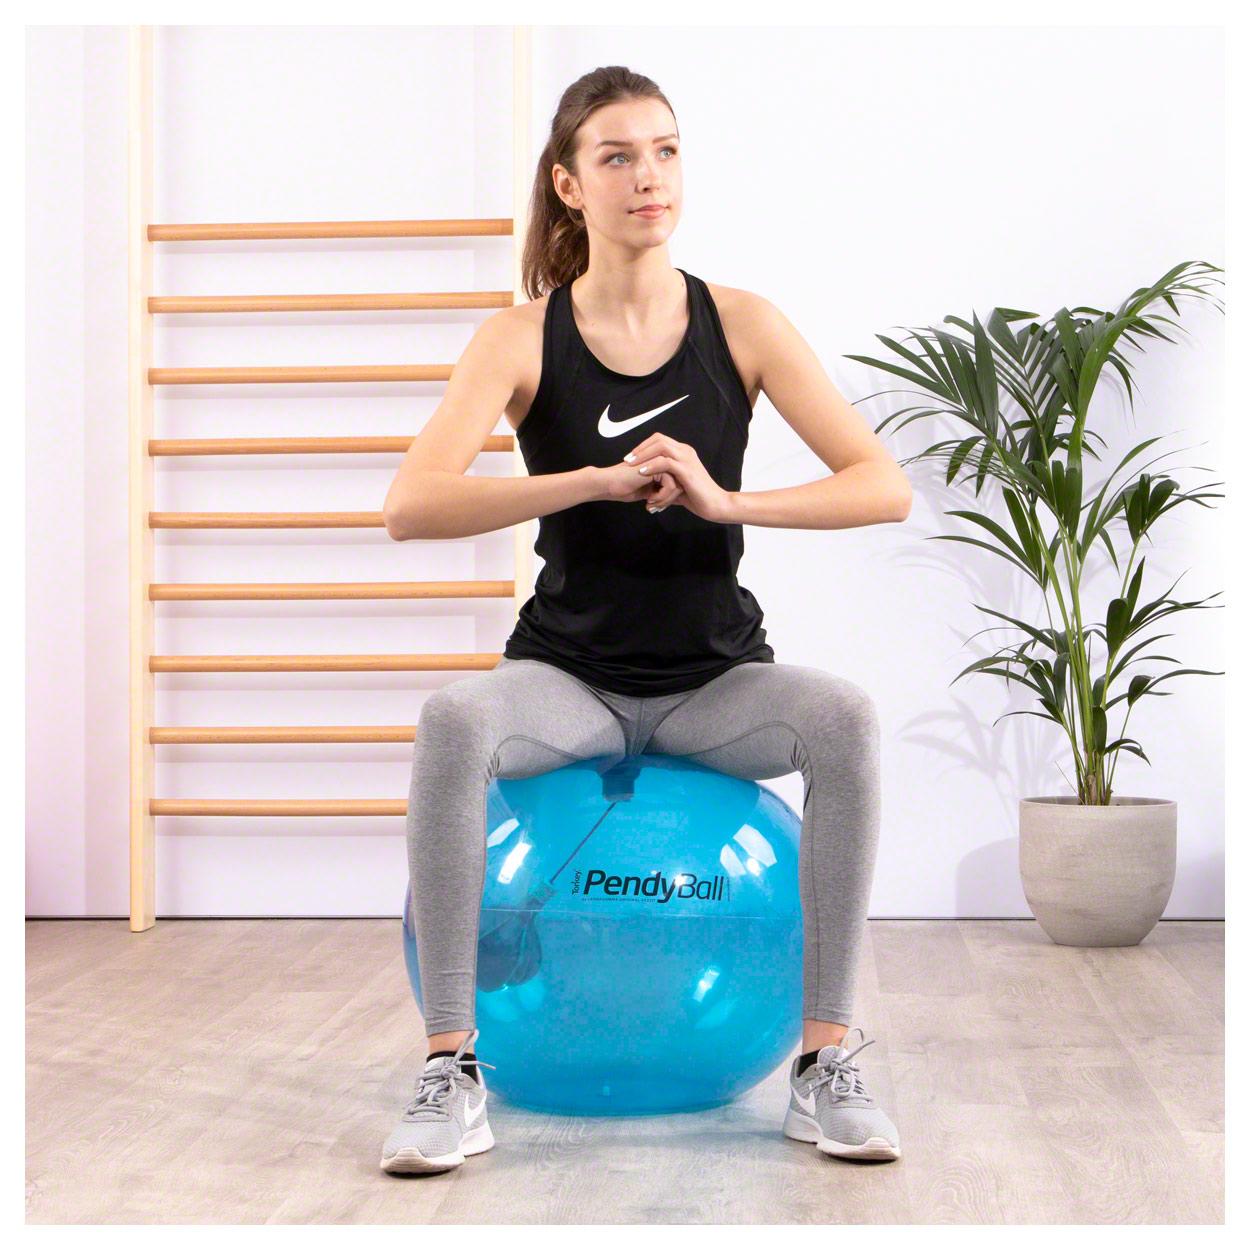 PEZZI-Gymnastikball-PendyBall-mit-Pendel-blau